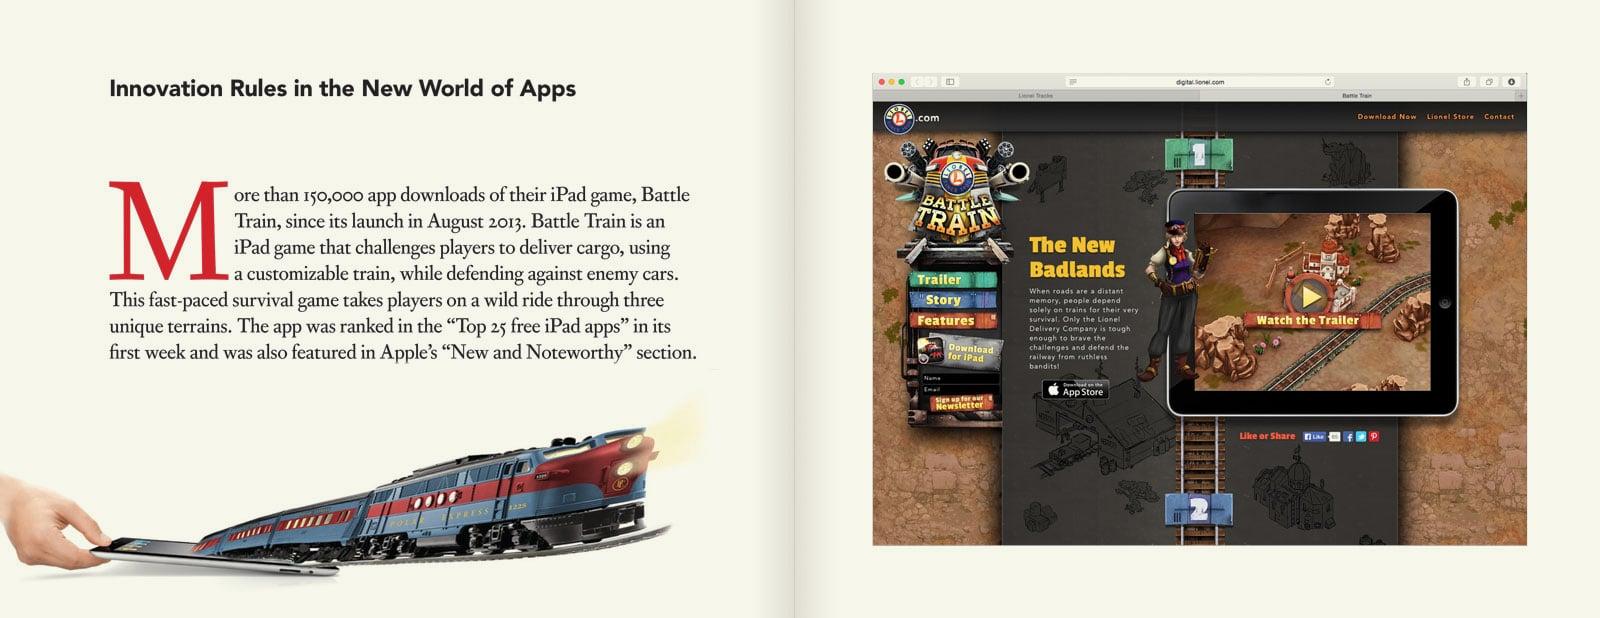 9-Lionel_Book-apps.jpg